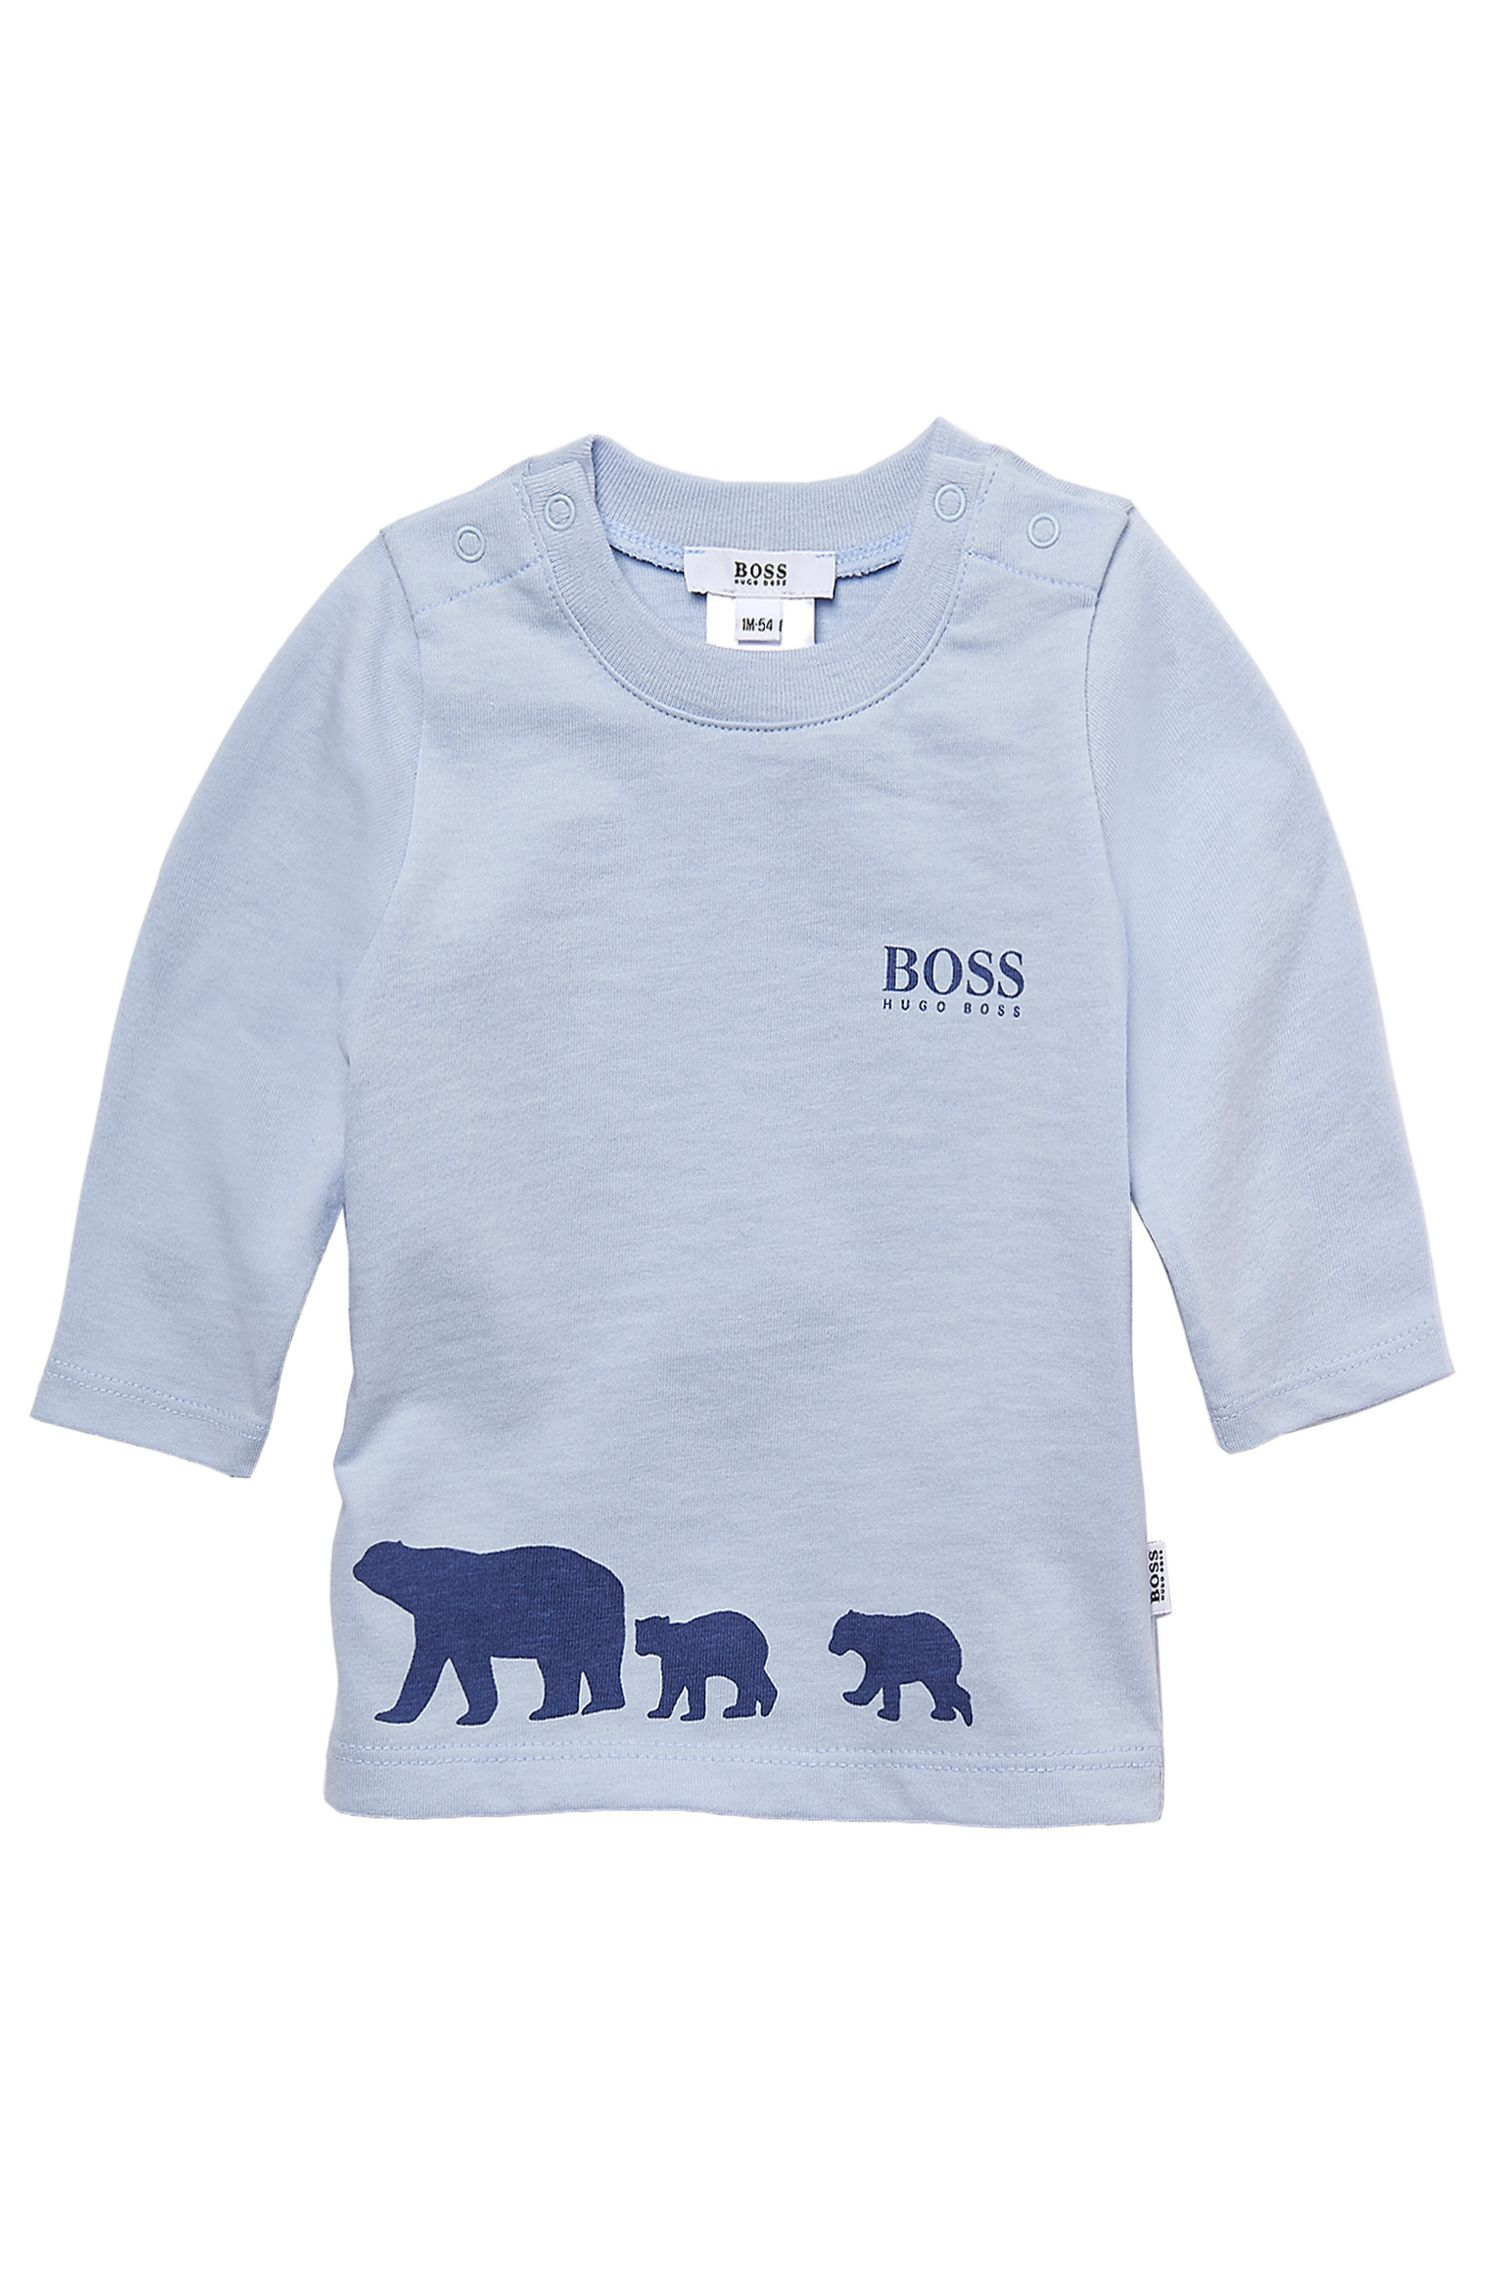 'J95113'   Infant Cotton Graphic Sweater